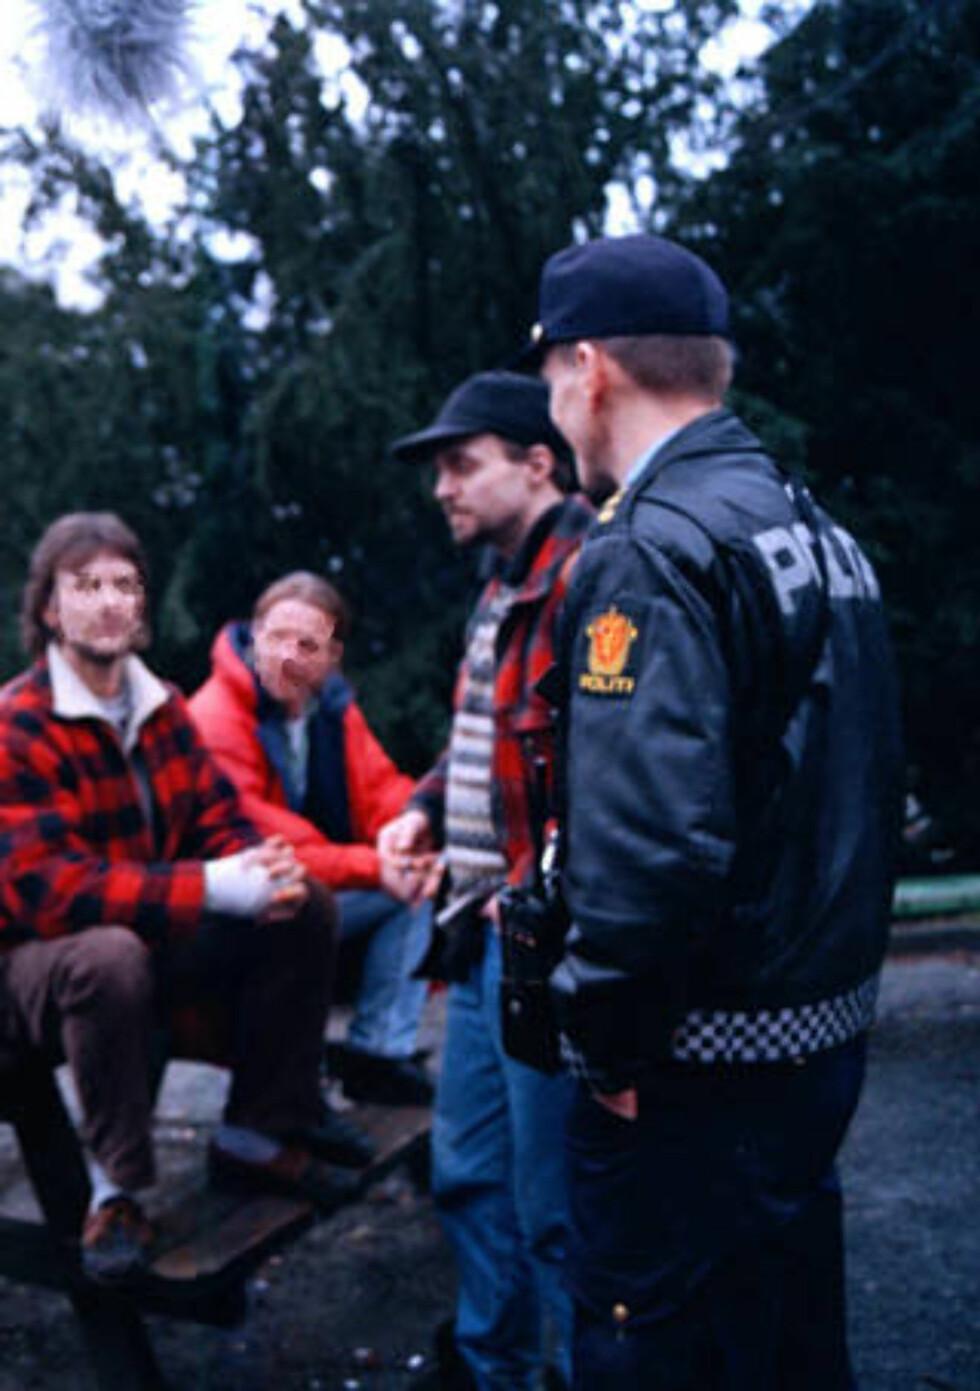 NYGÅRDSPARKEN: Mange av de narkomane i Bergen oppholder seg i Nygårdsparken. I følge politiet er miljøet voksende. Foto: DAGBLADET